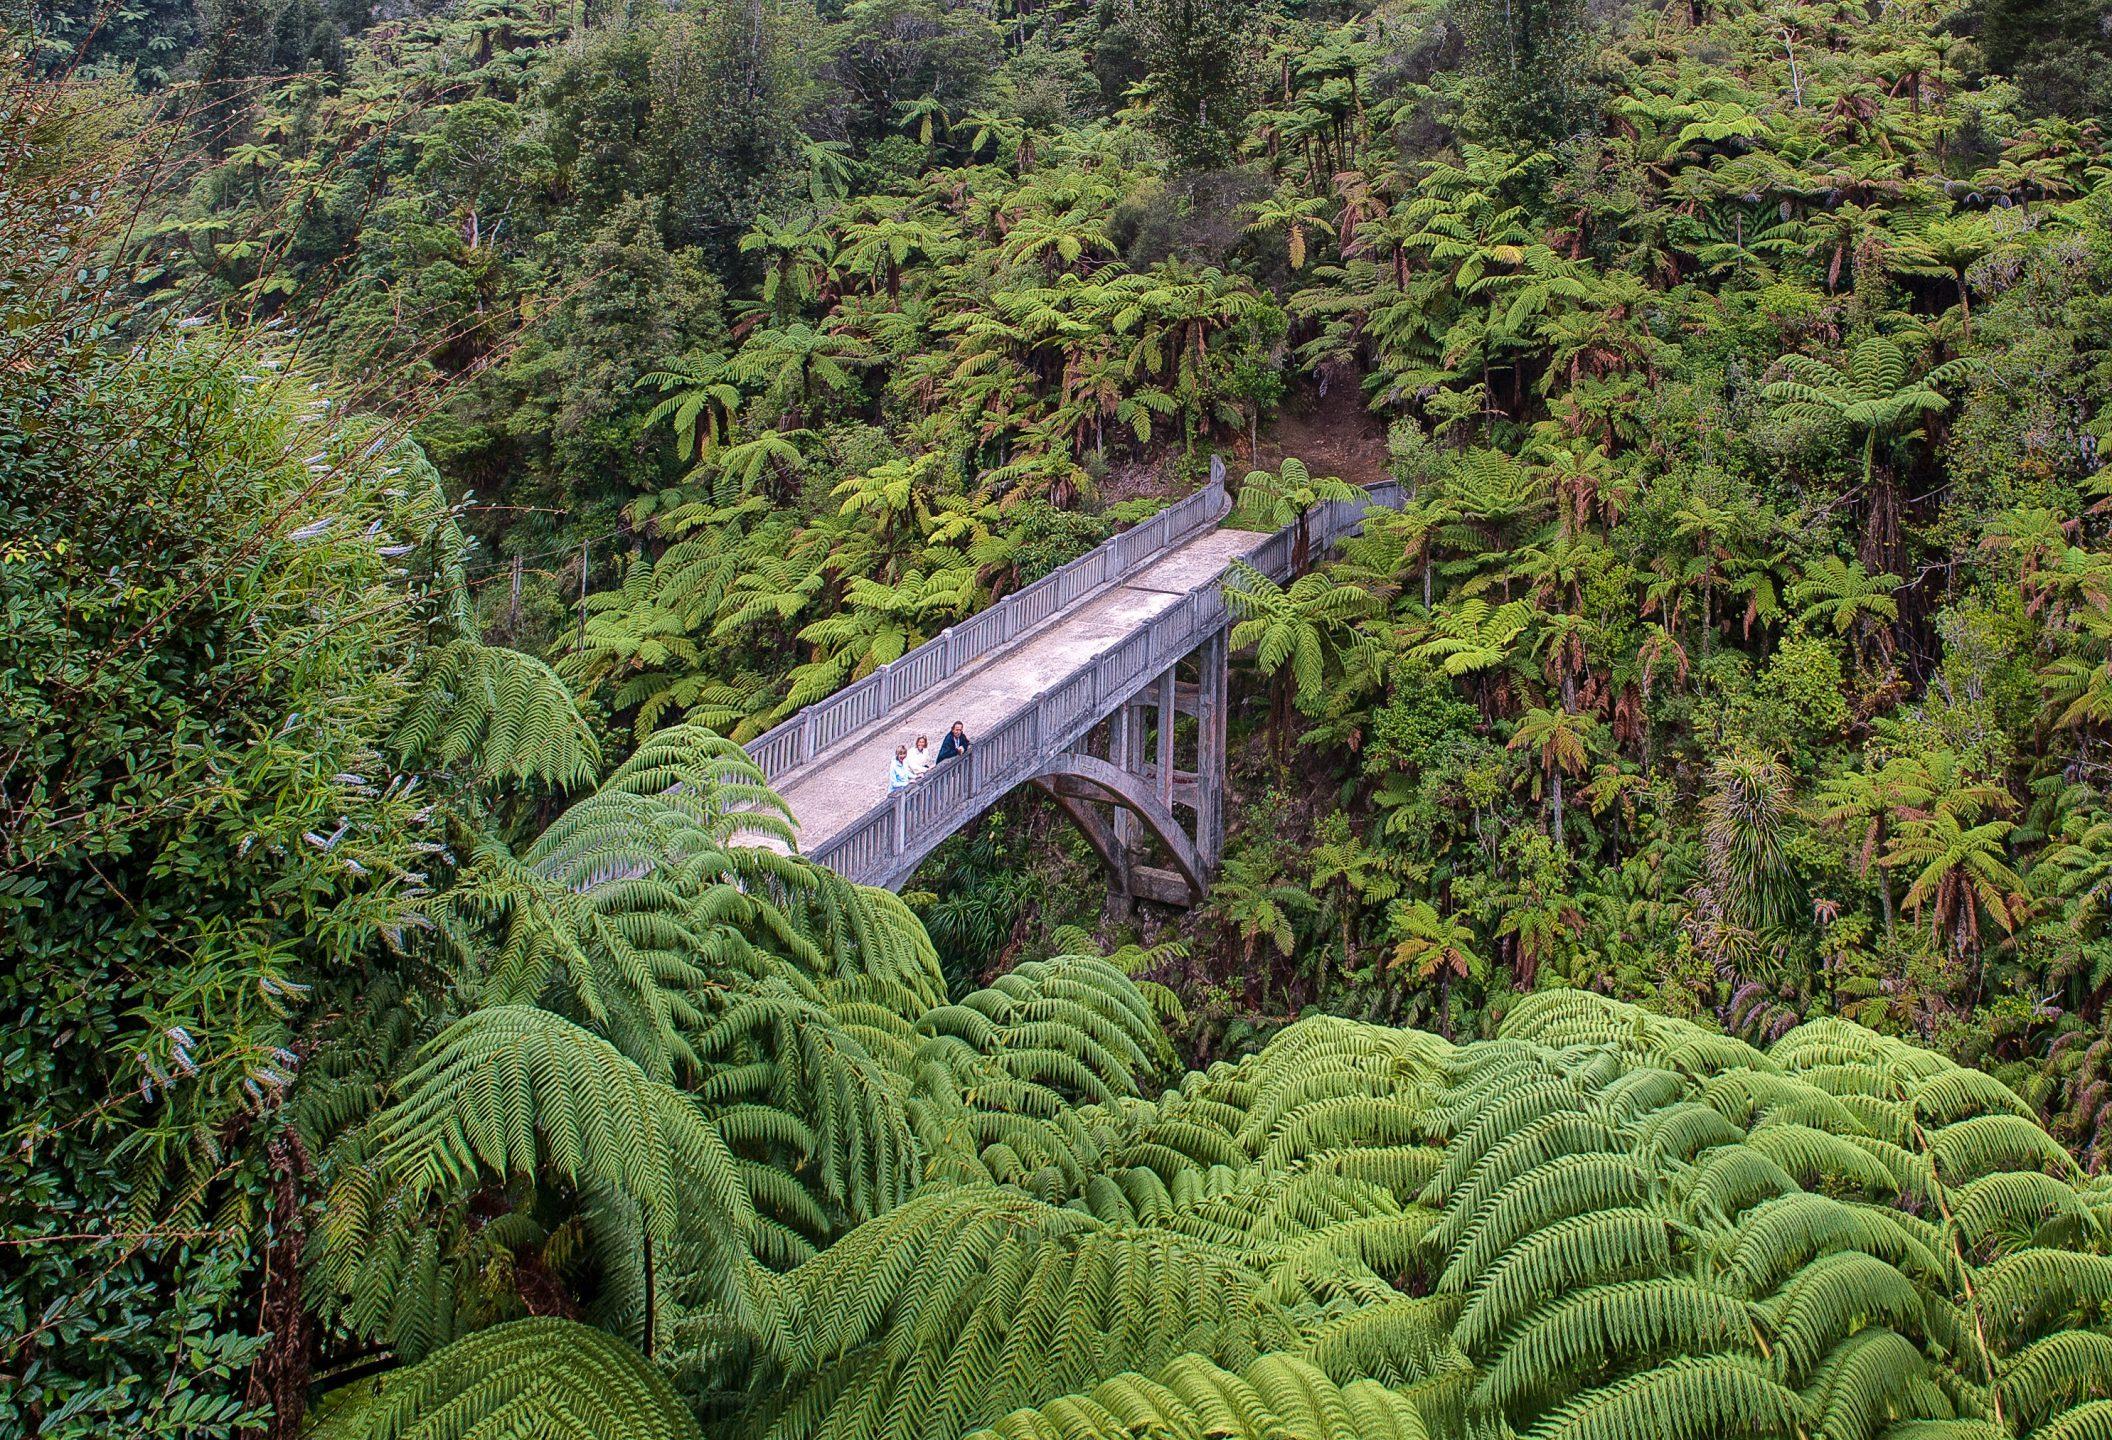 Bridge in a dense forest